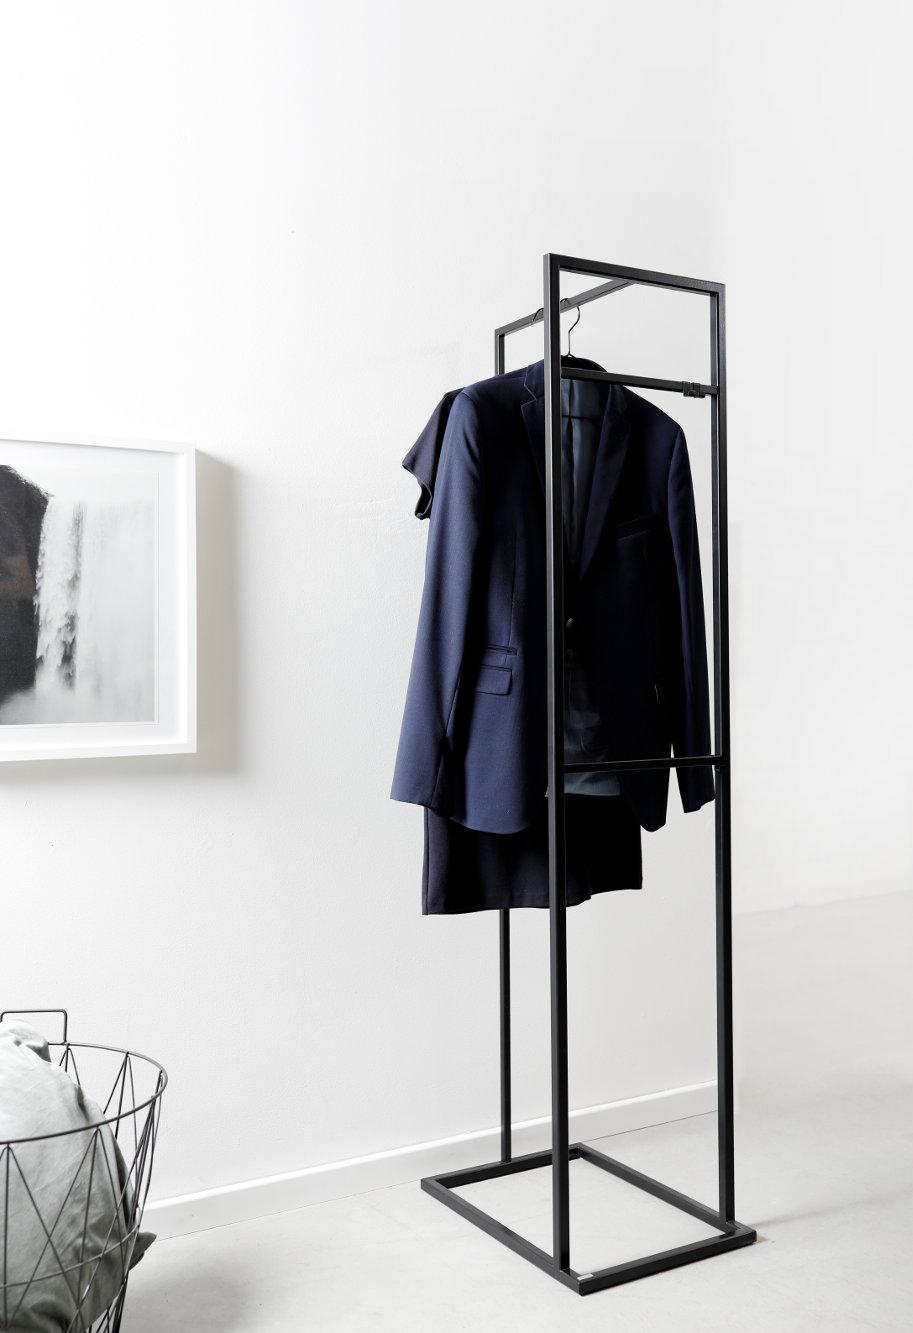 exklusive stumme diener herrendiener goldau noelle manufaktur. Black Bedroom Furniture Sets. Home Design Ideas